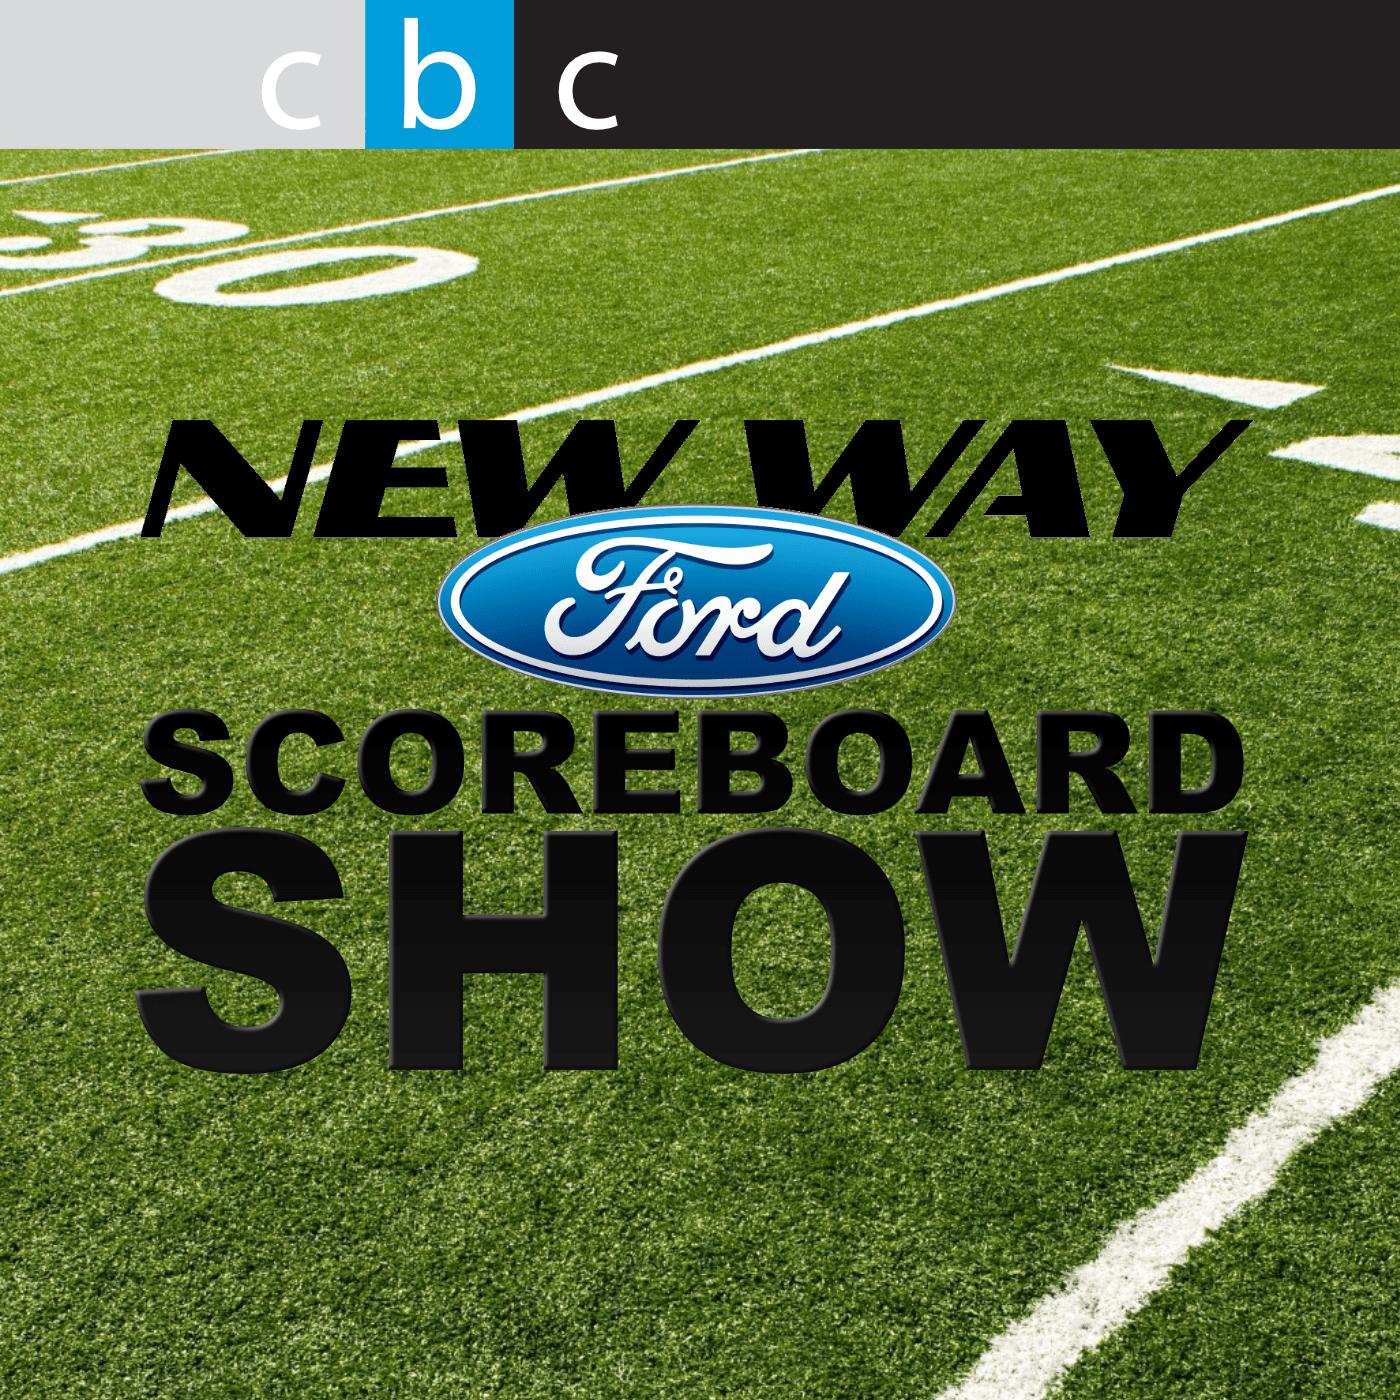 New Way Ford Scoreboard Show